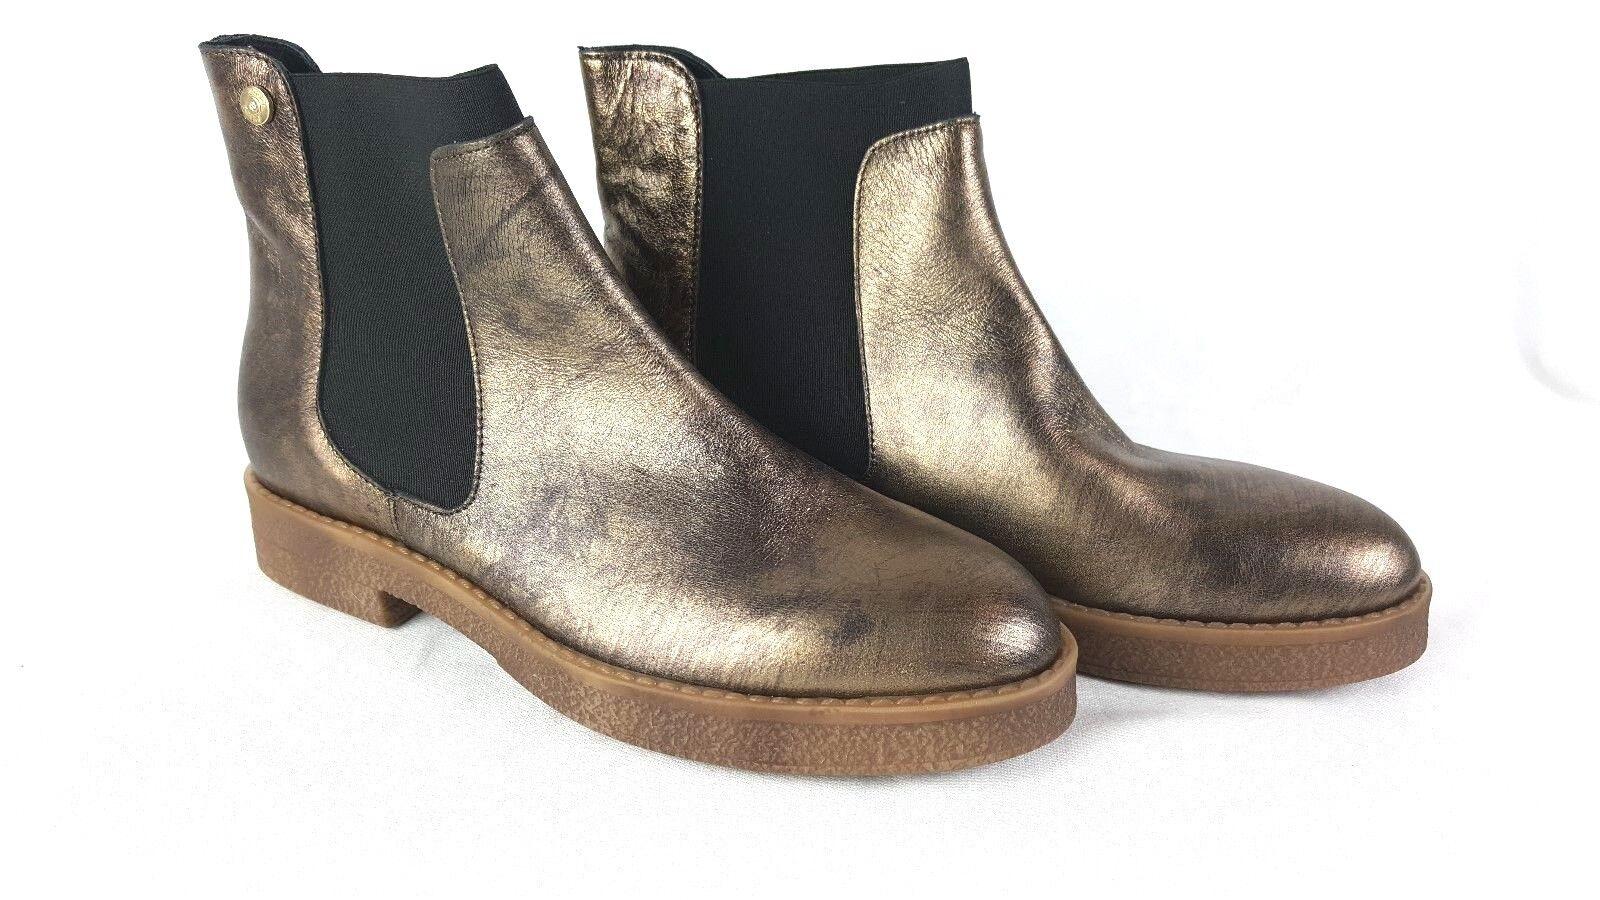 ad0d29d8458a ... NEUF LIU LIU LIU JO Jeans Bottes Femmes & Bottines or taille 39 // 05  ...